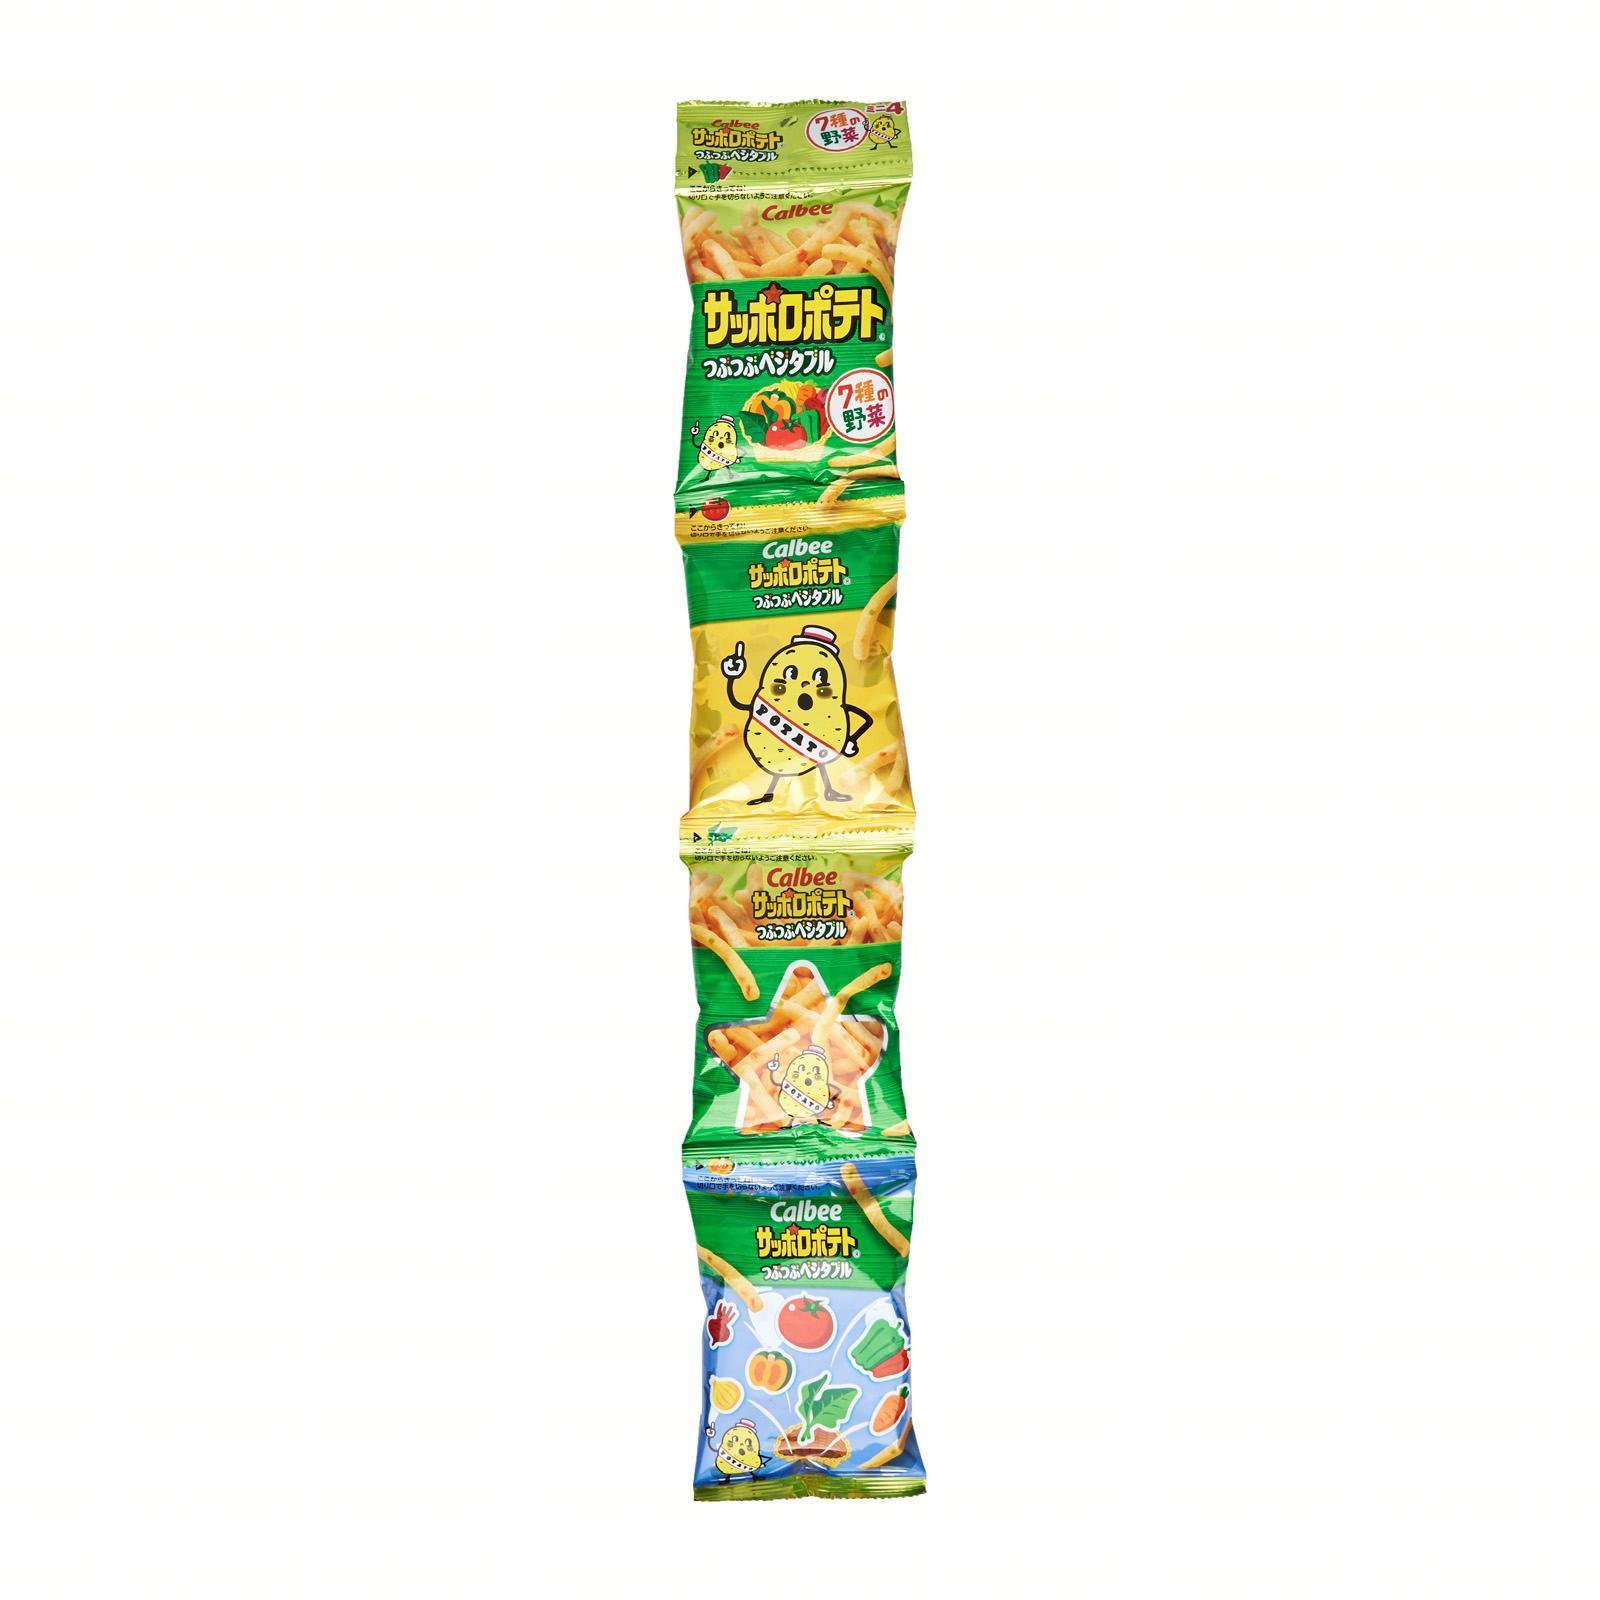 Calbee Japan Sapporo Potato Tsubu Tsubu Vegetable Snack (4 Mini Packs) - Kirei